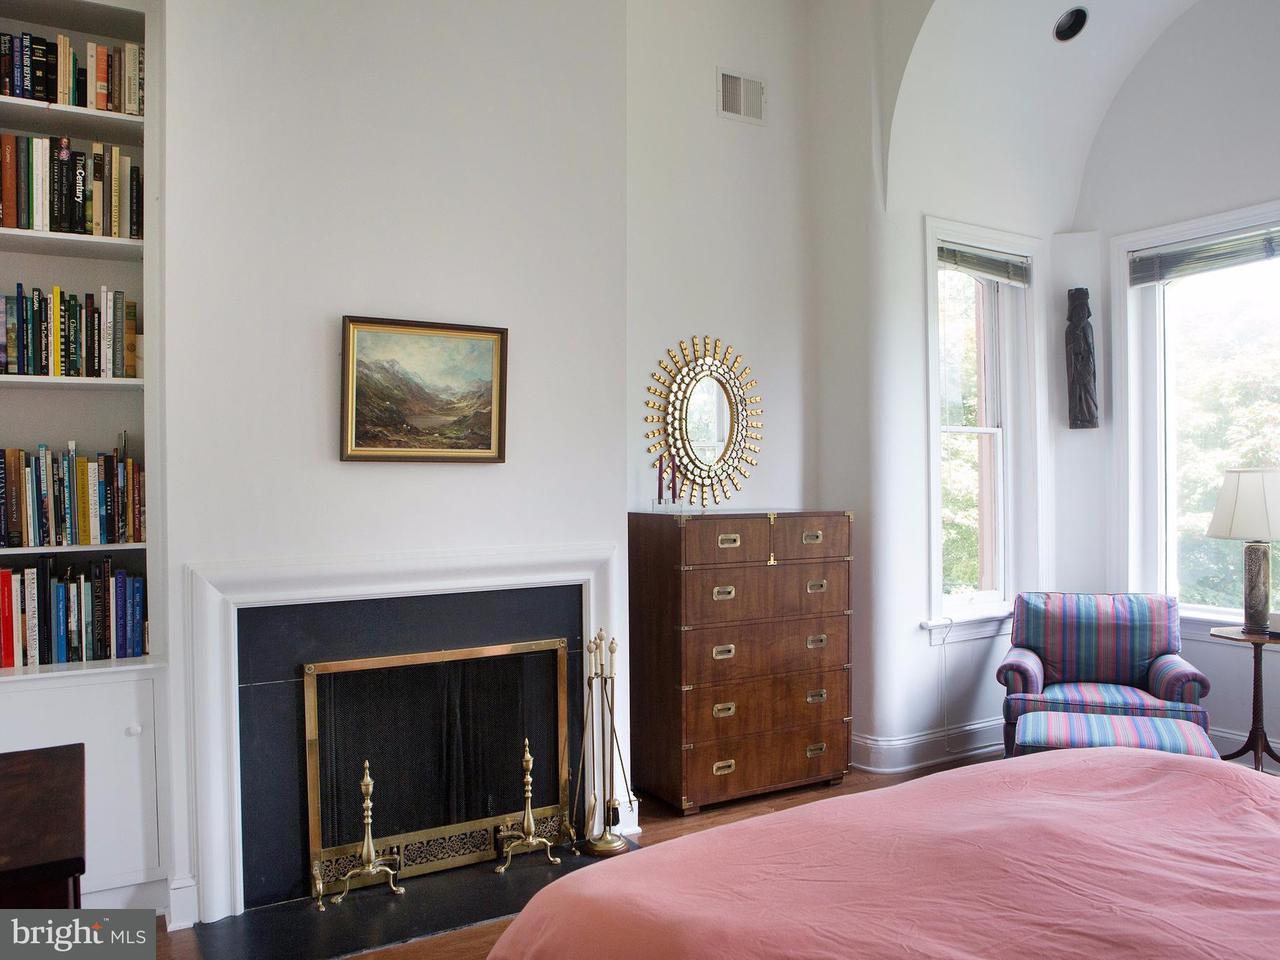 Additional photo for property listing at 323 5th St Se 323 5th St Se Washington, Округ Колумбия 20003 Соединенные Штаты